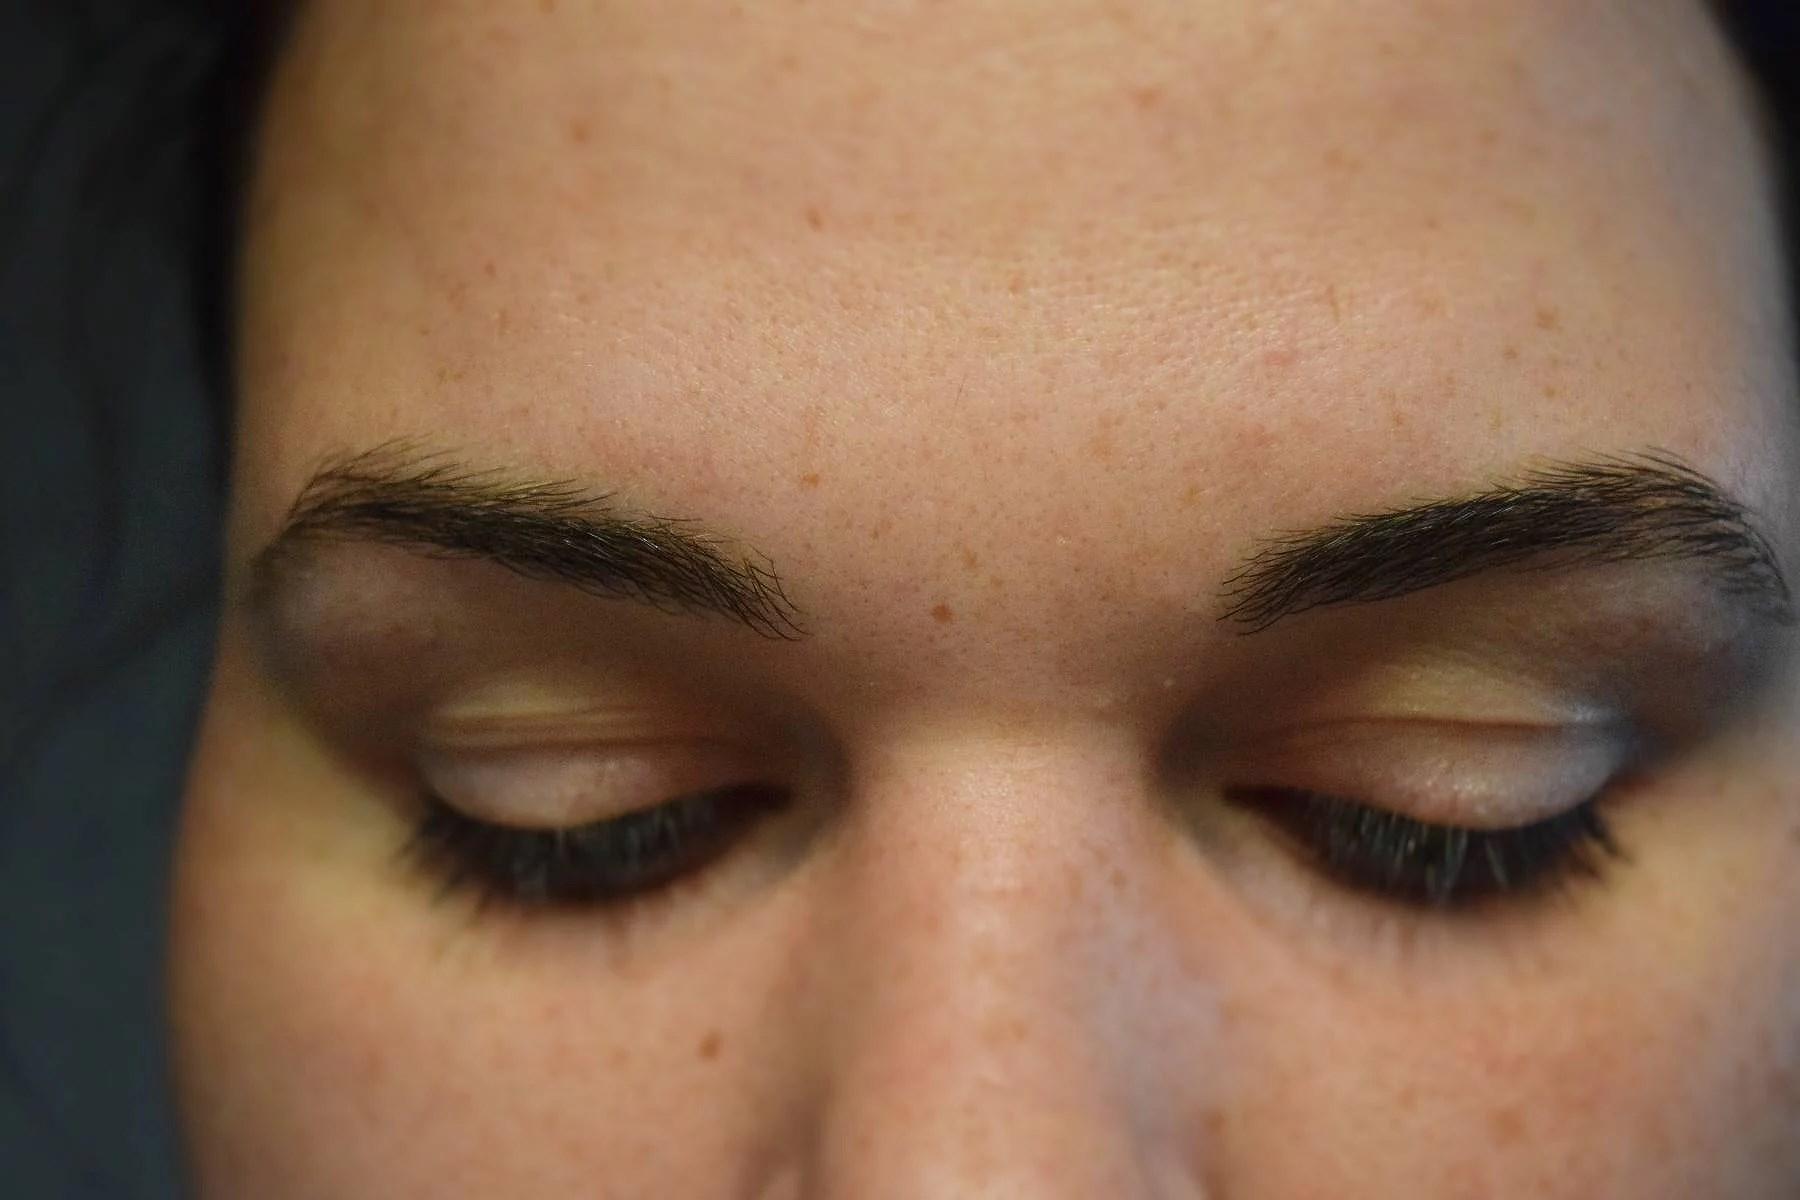 Trådat ögonbrynen